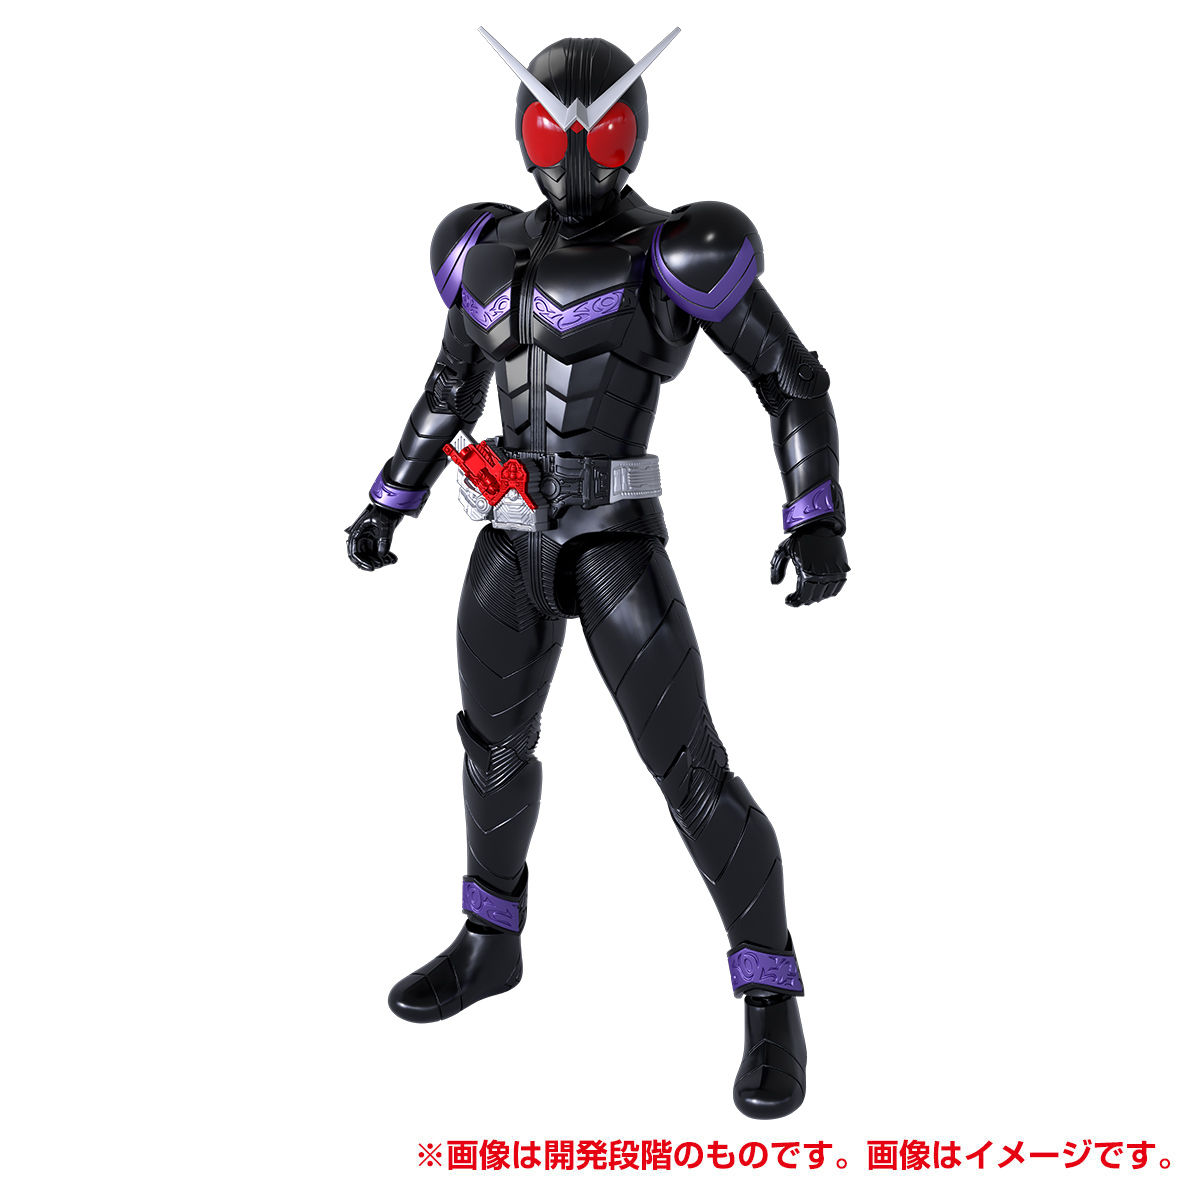 RKF RIDER KICK'S FIGURE 仮面ライダージョーカー